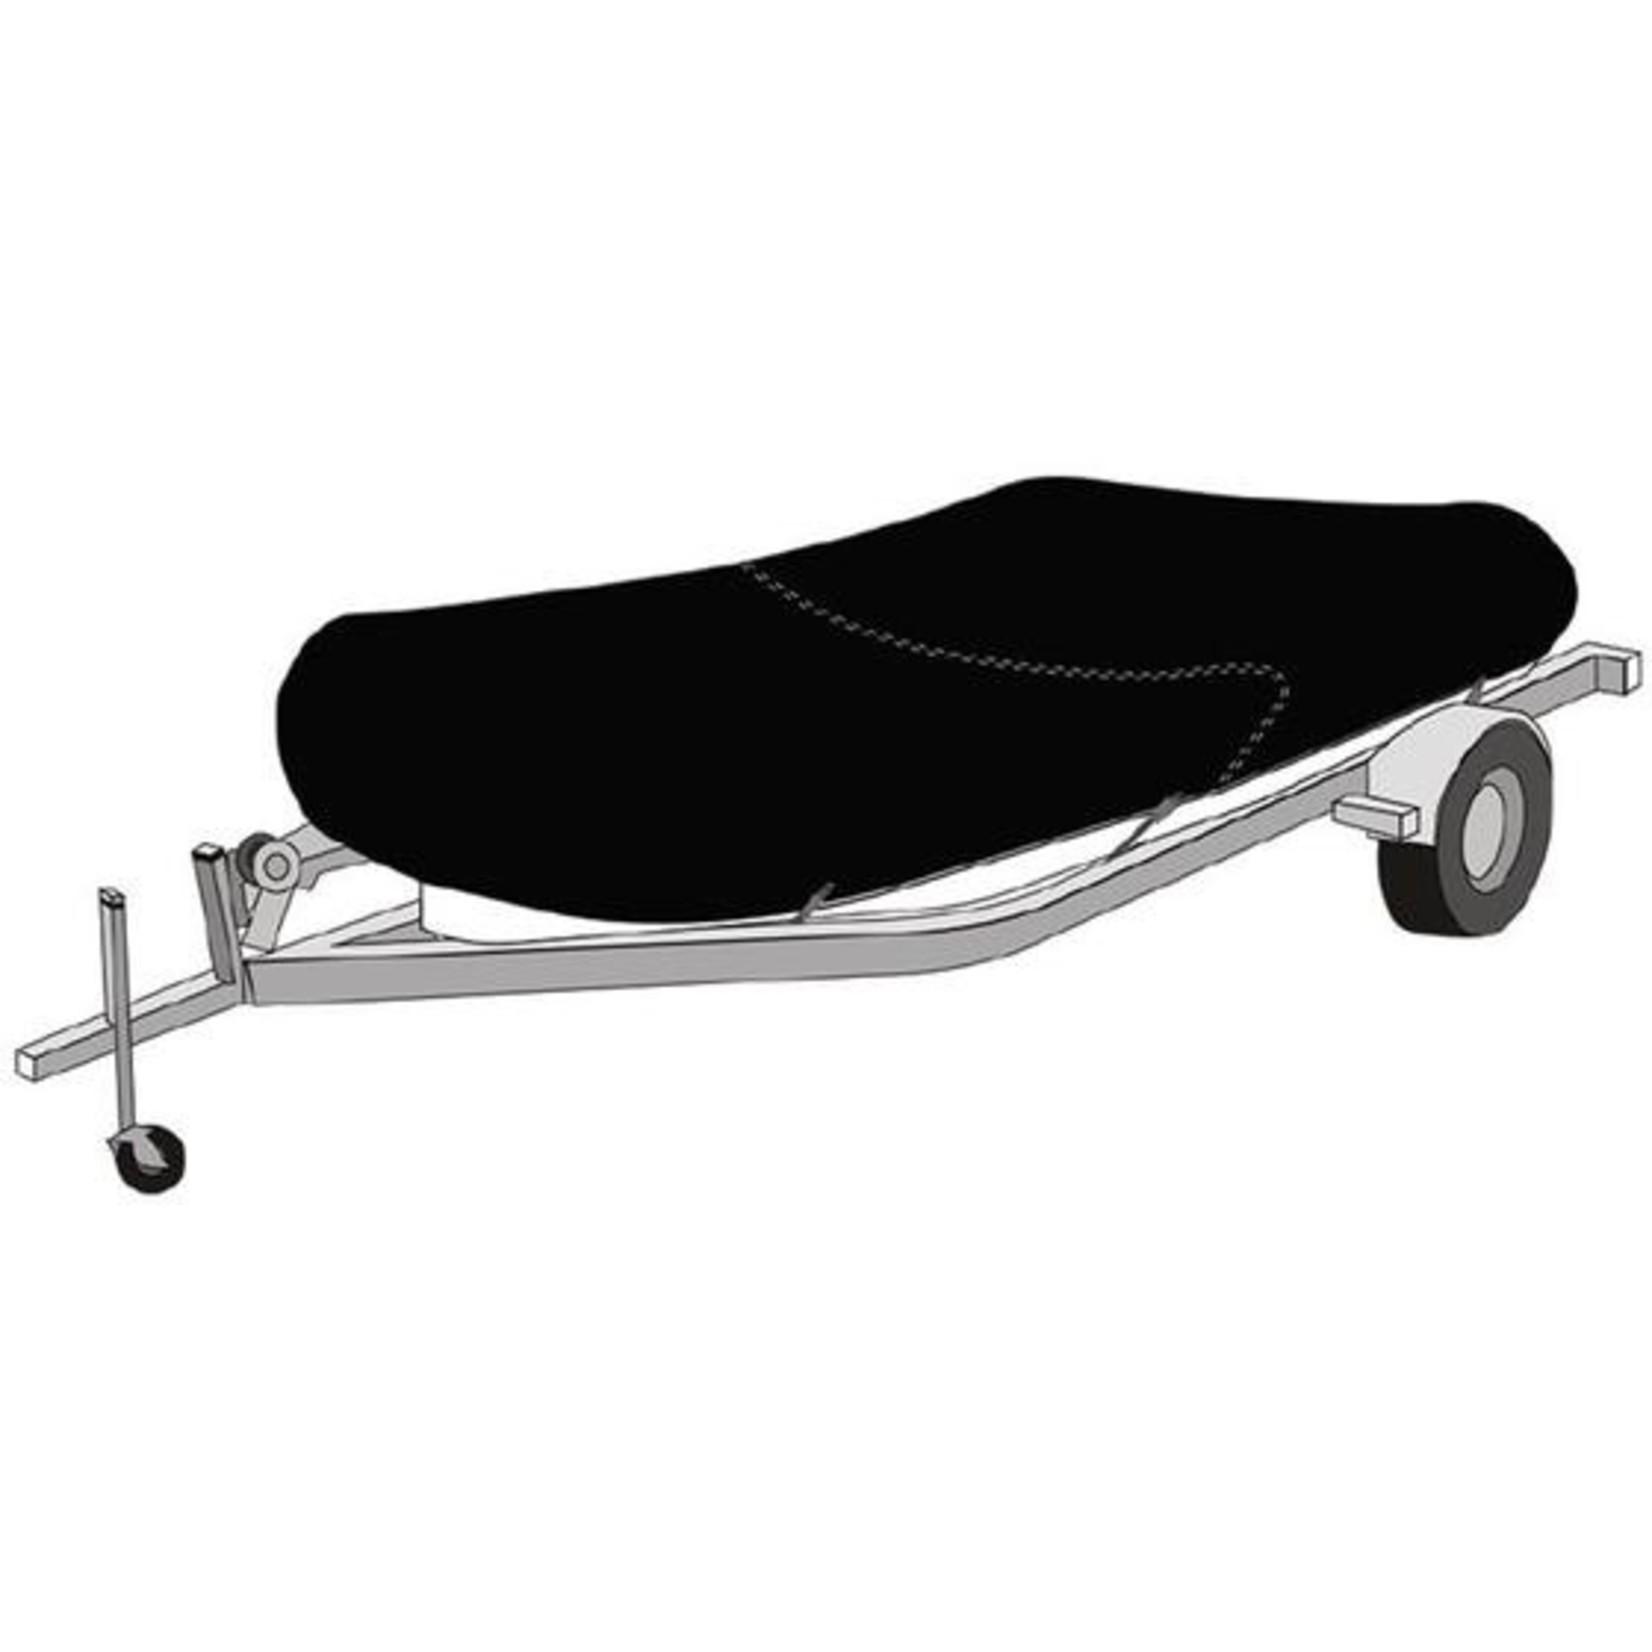 Exalto Inflatable boatcover Size E - length: 3.40 - 3.70 m